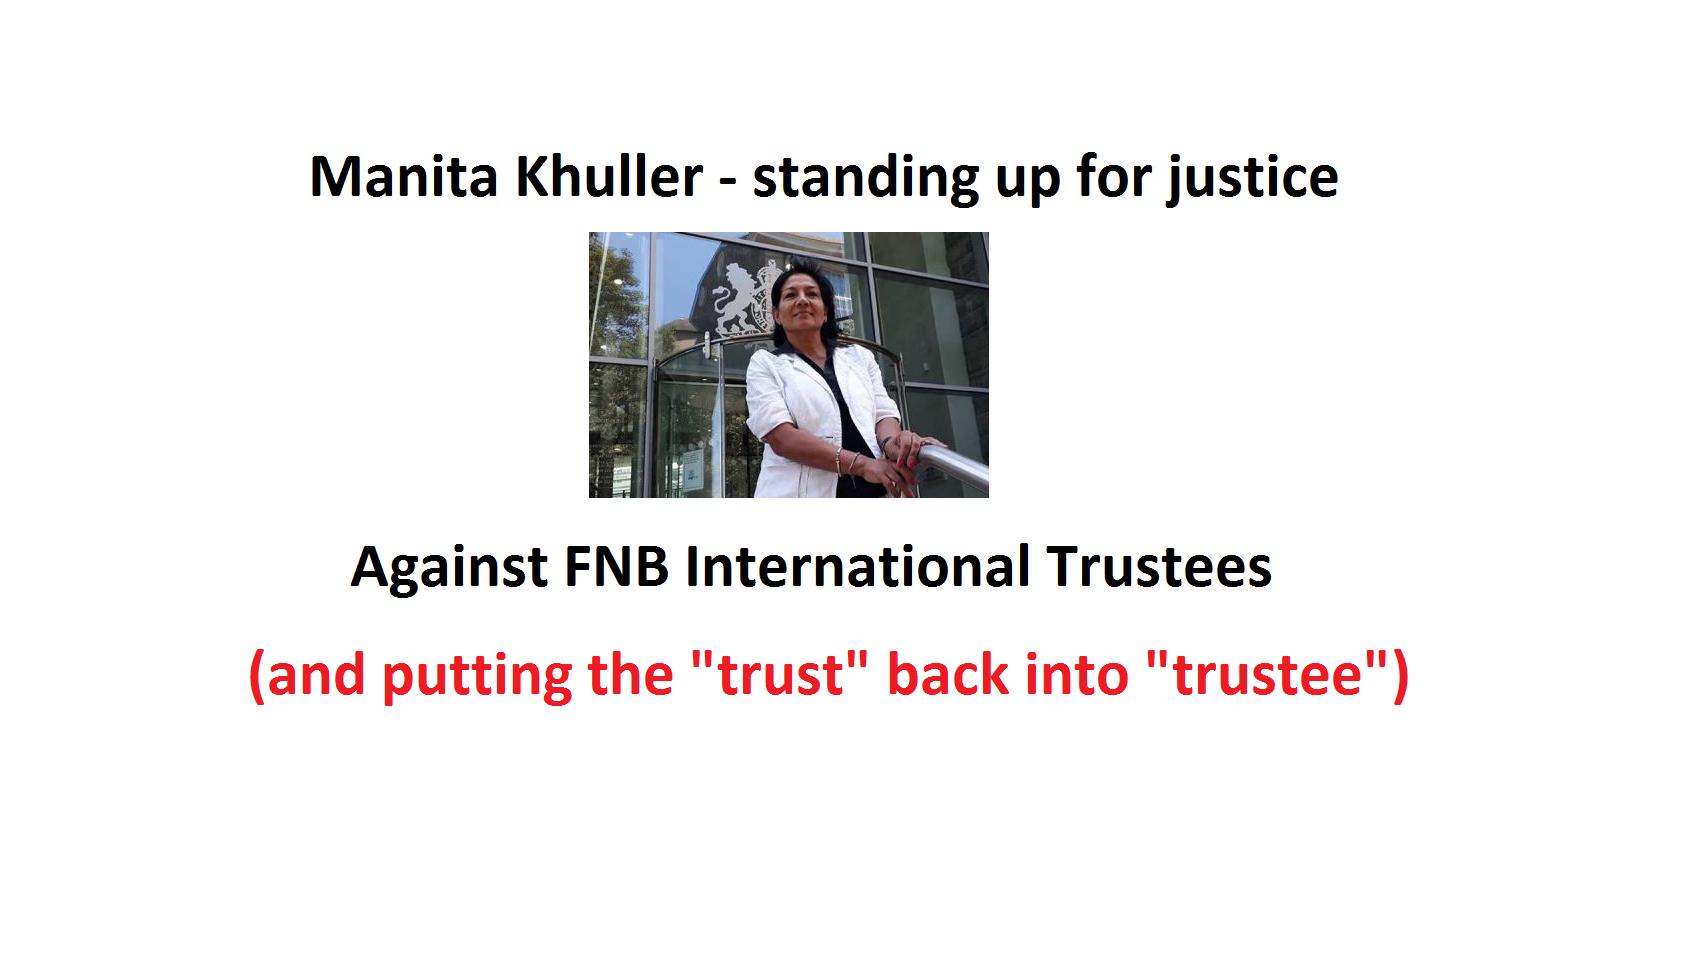 Pension Life Blog - FNB International Trustees Guernsey - Manita Khuller - standing up for justice